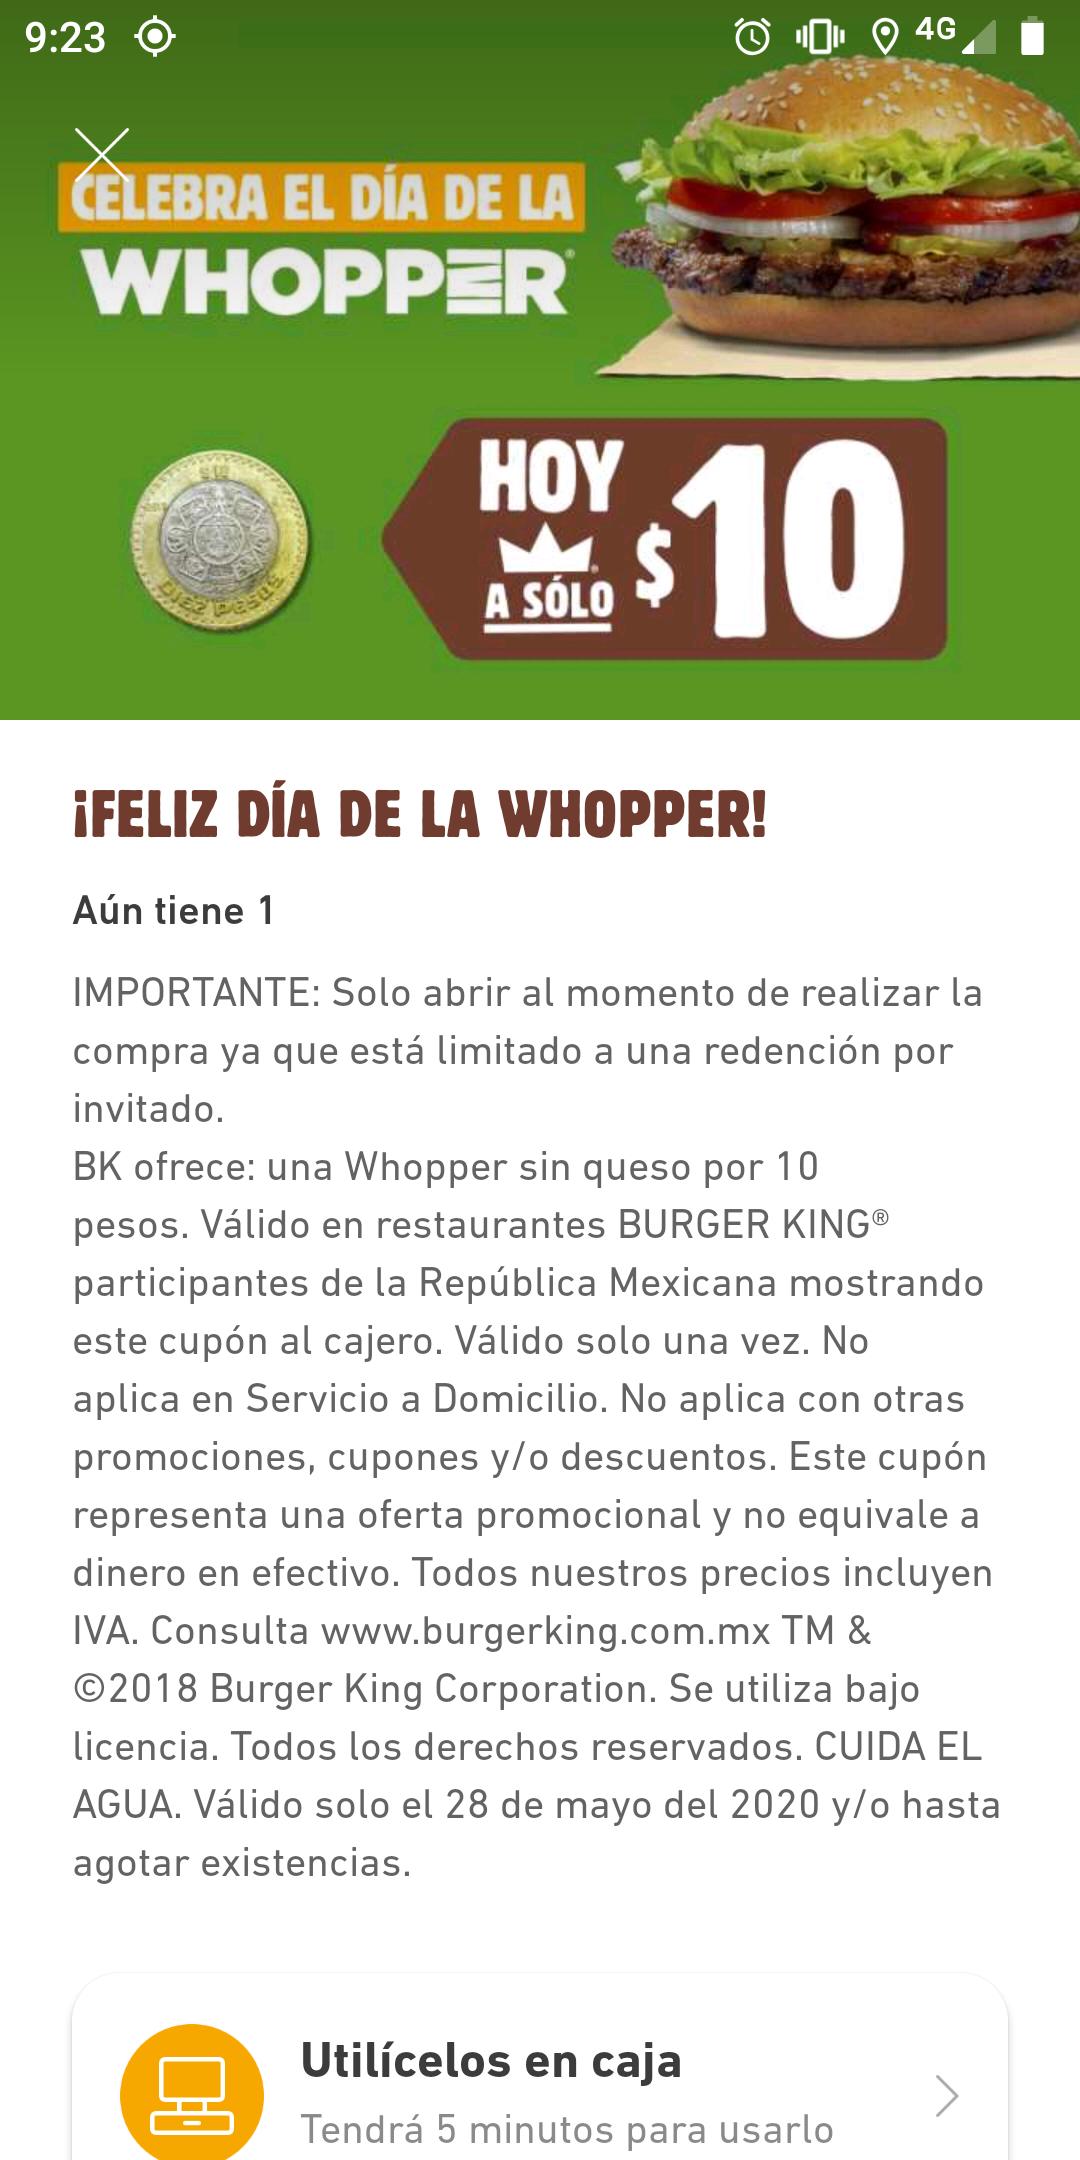 Burger King: Whopper a solo $10.00